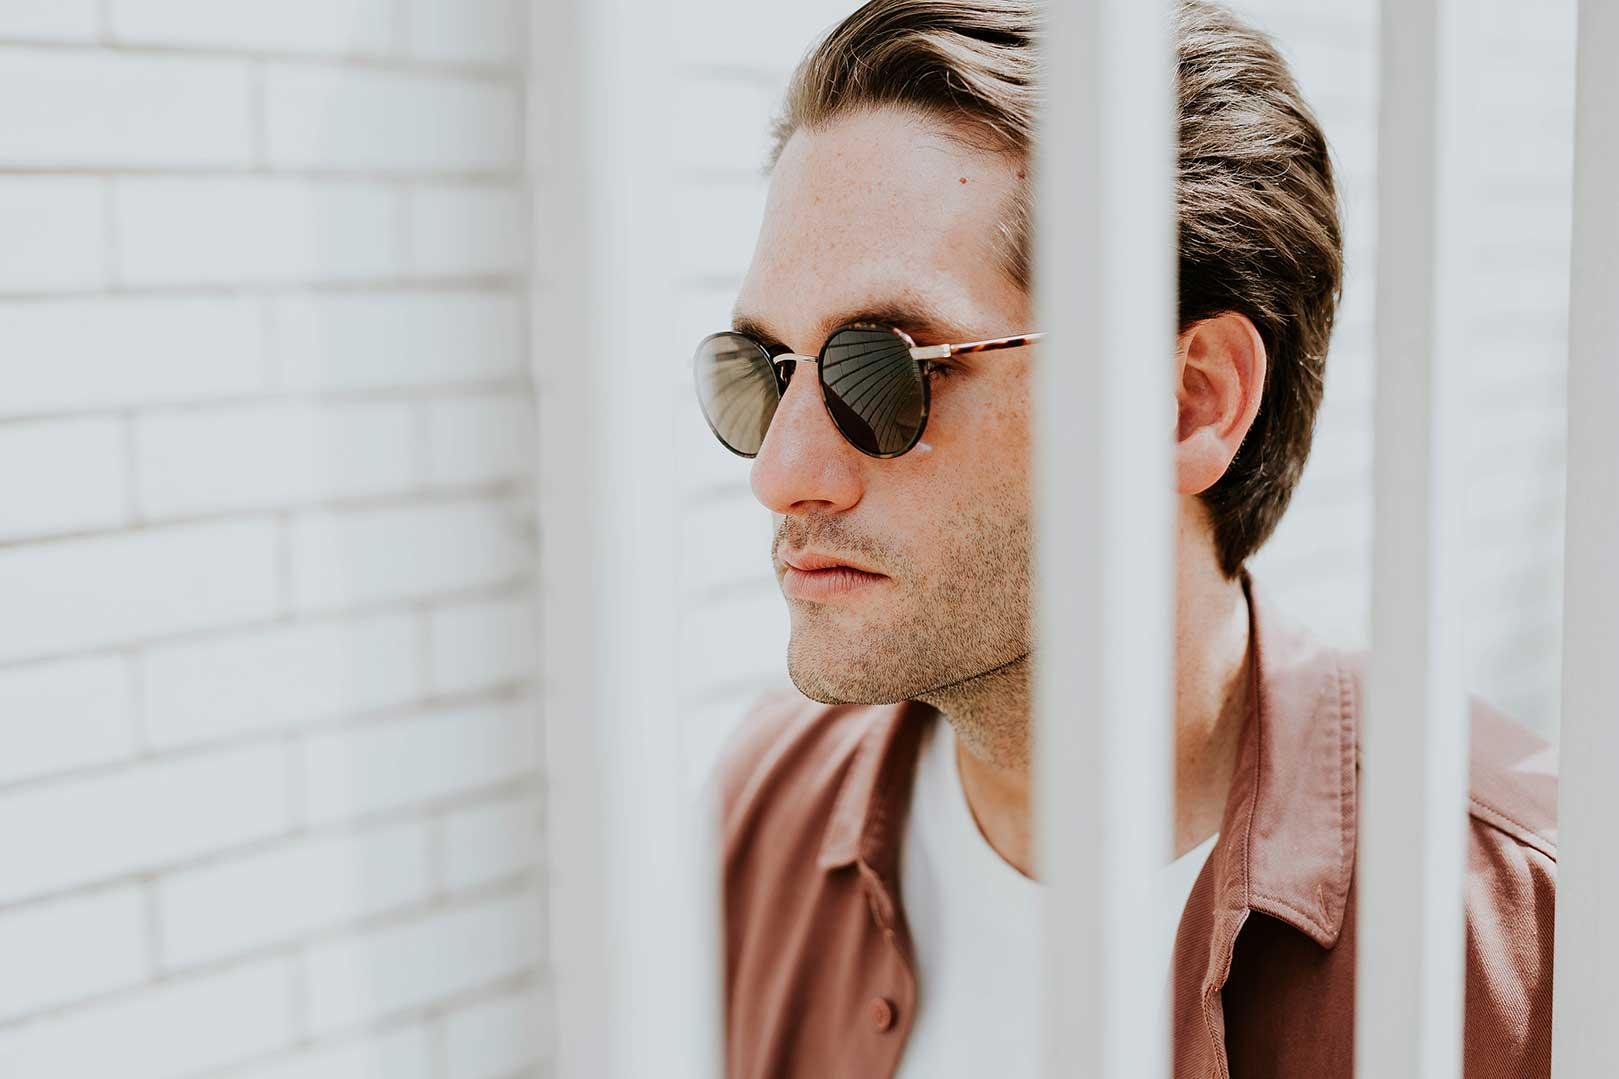 occhiali da sole e vista insieme